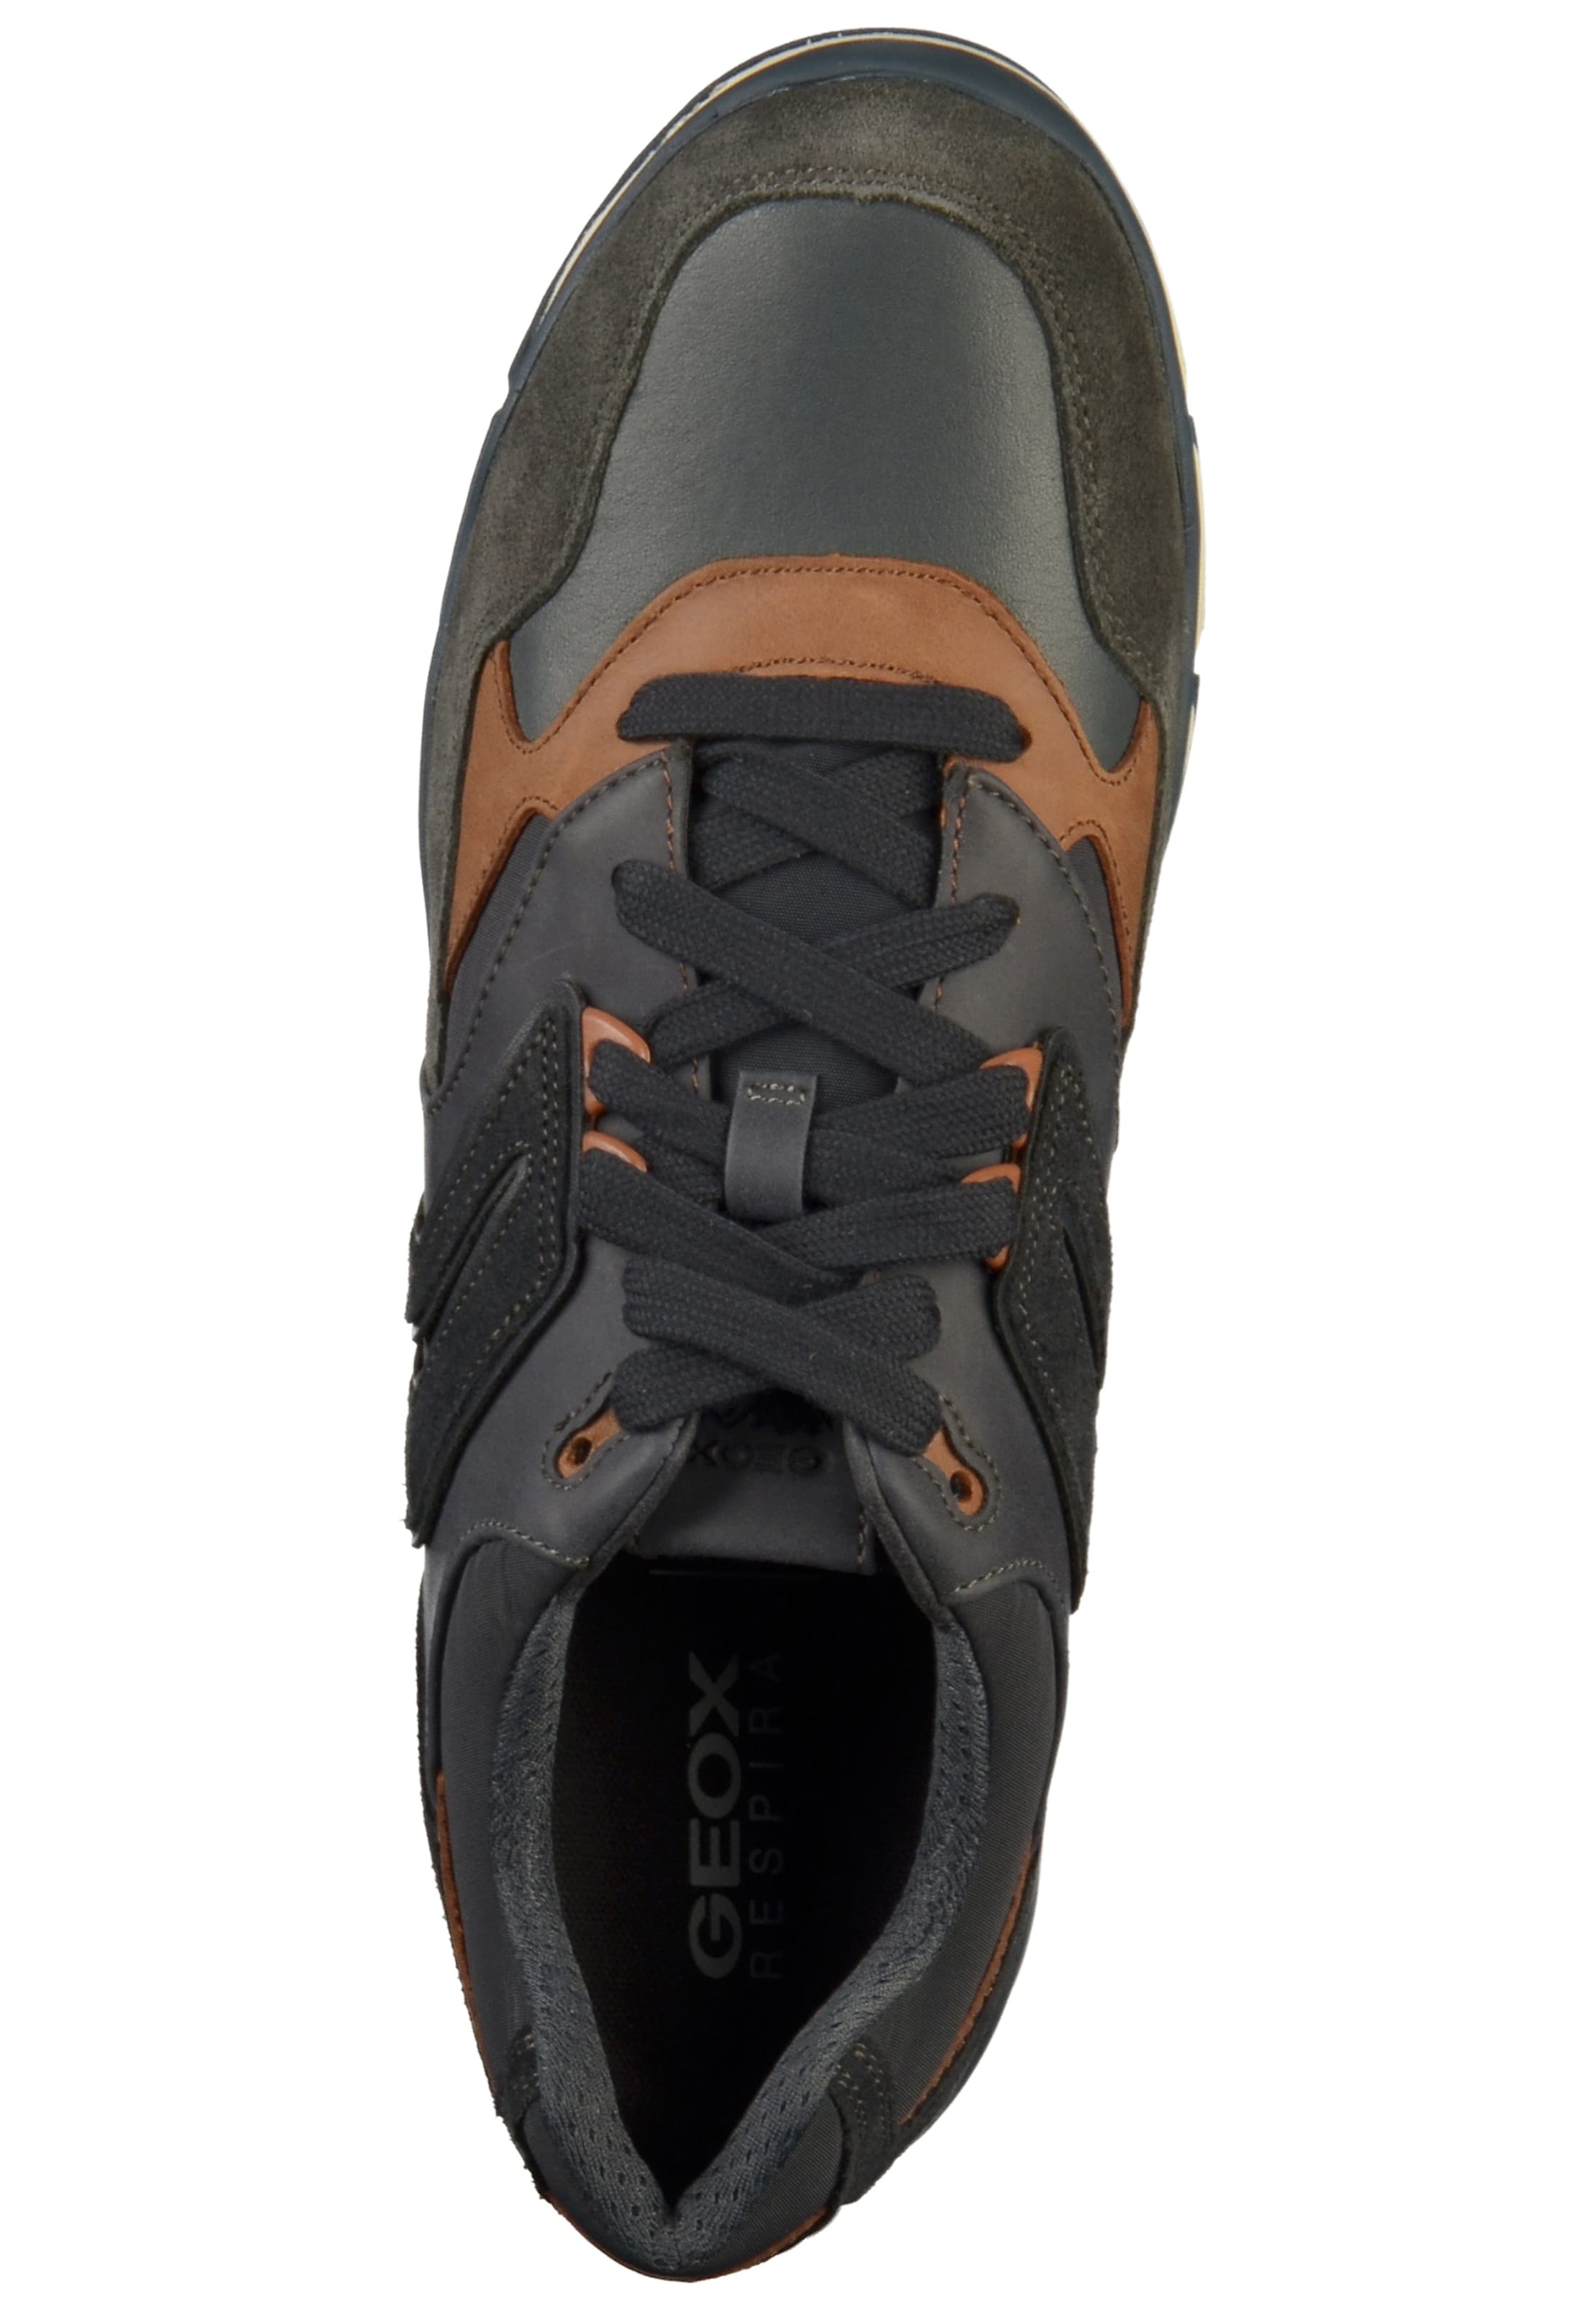 NavyHellbraun Geox Sneaker In NavyHellbraun In Sneaker In Sneaker Geox Oliv Geox Oliv nO80wkPX